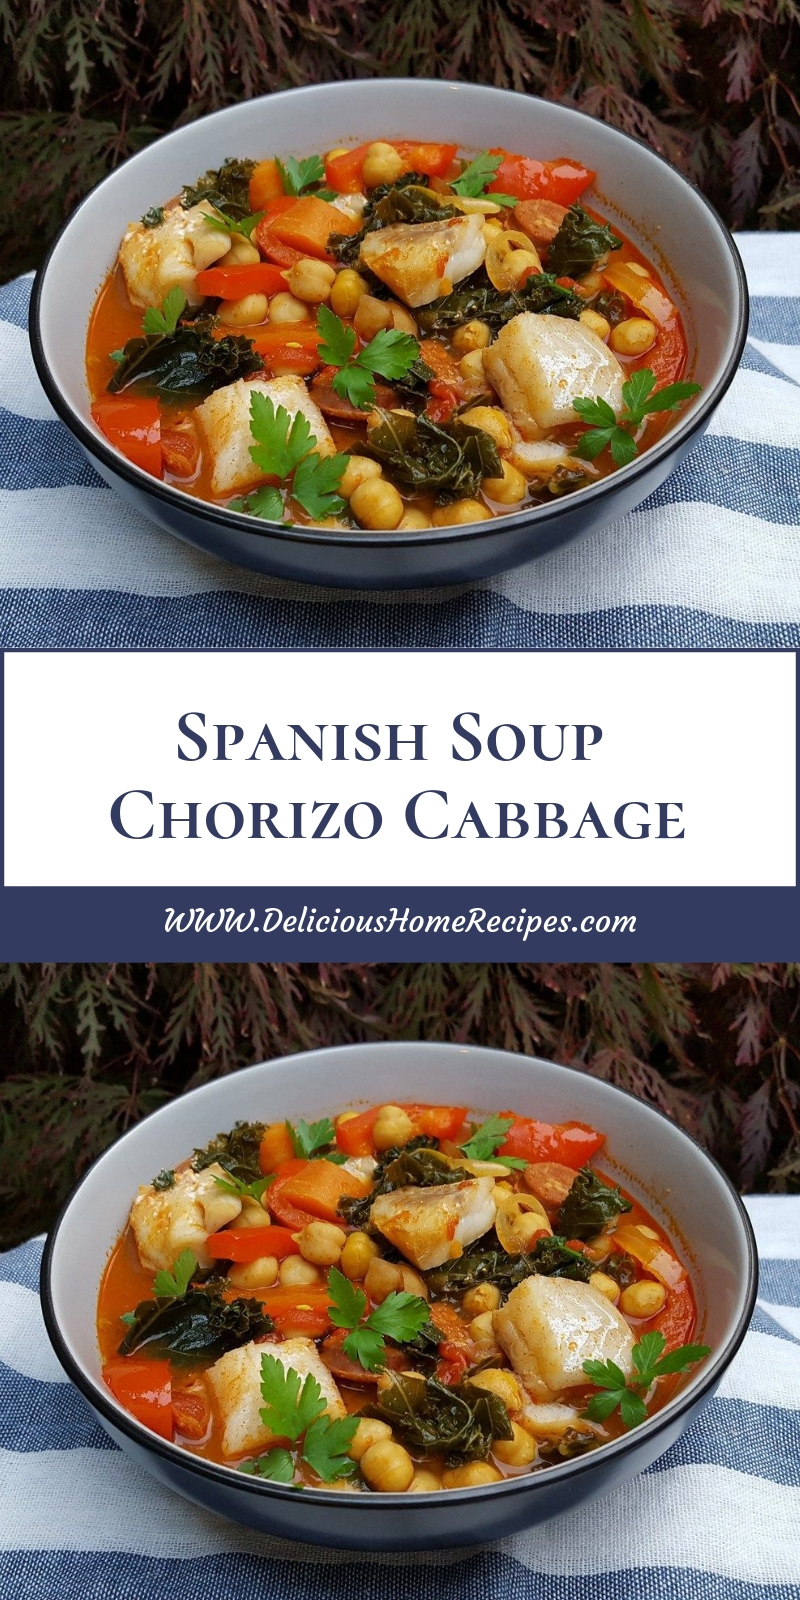 Spanish Soup Chorizo Cabbage